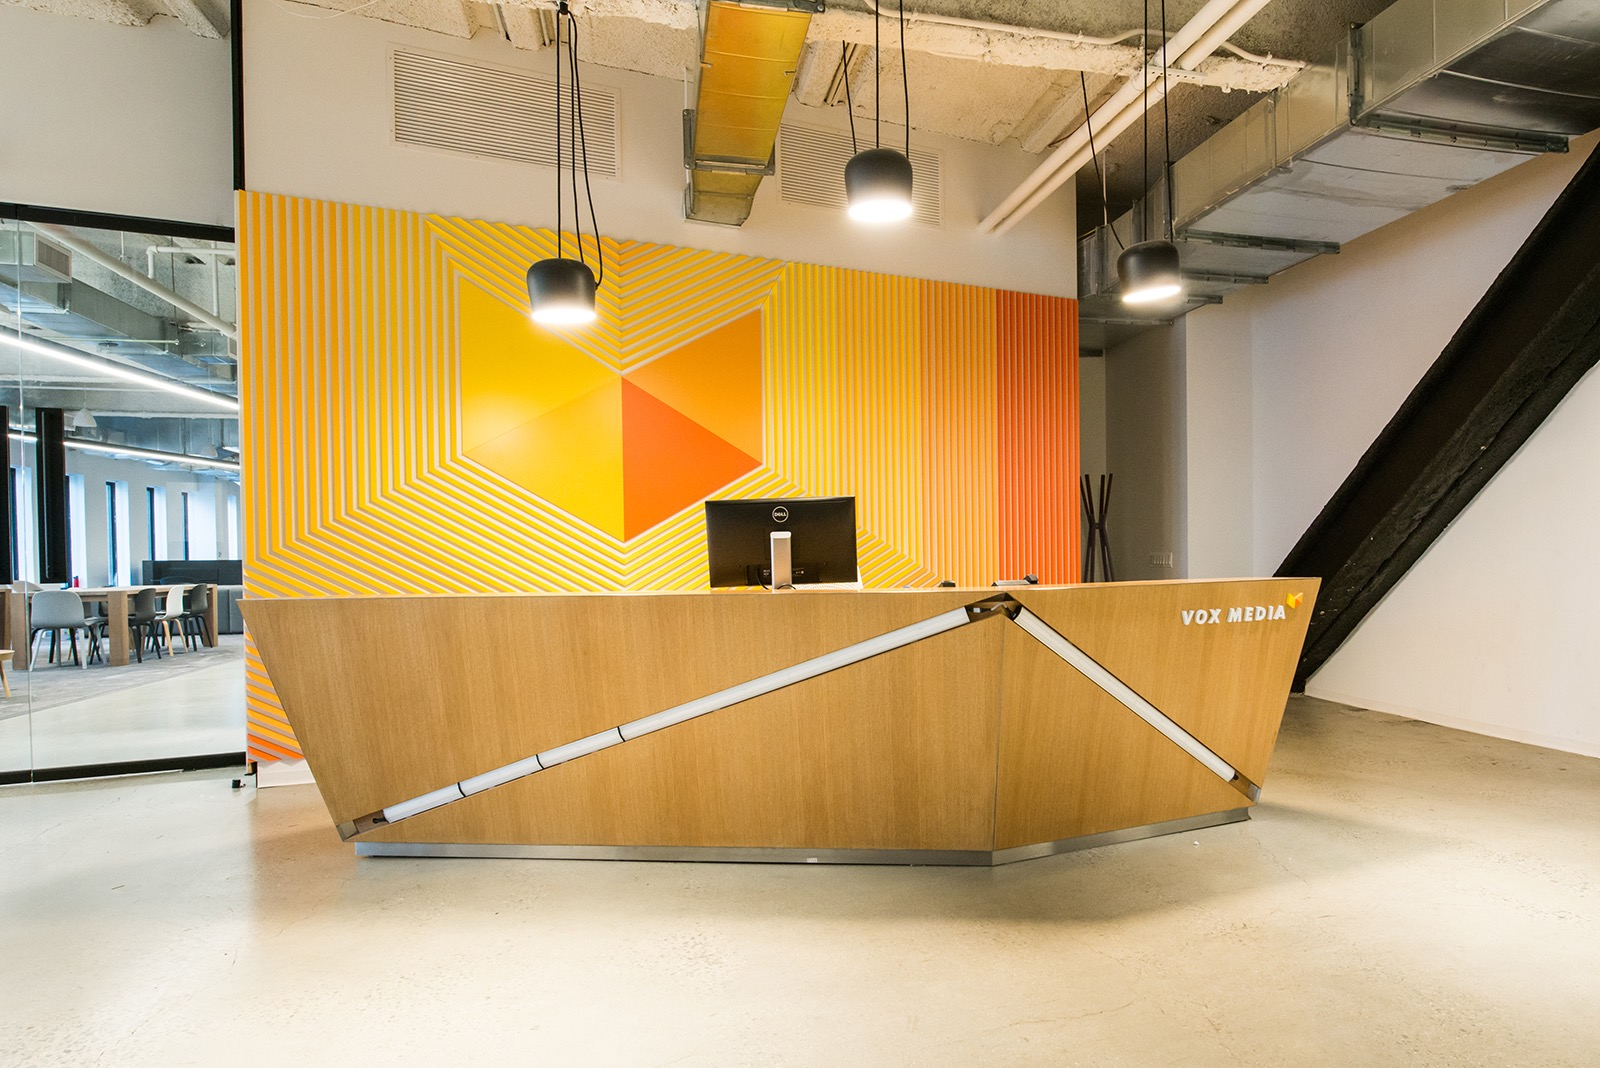 vox-media-nyc-office-2